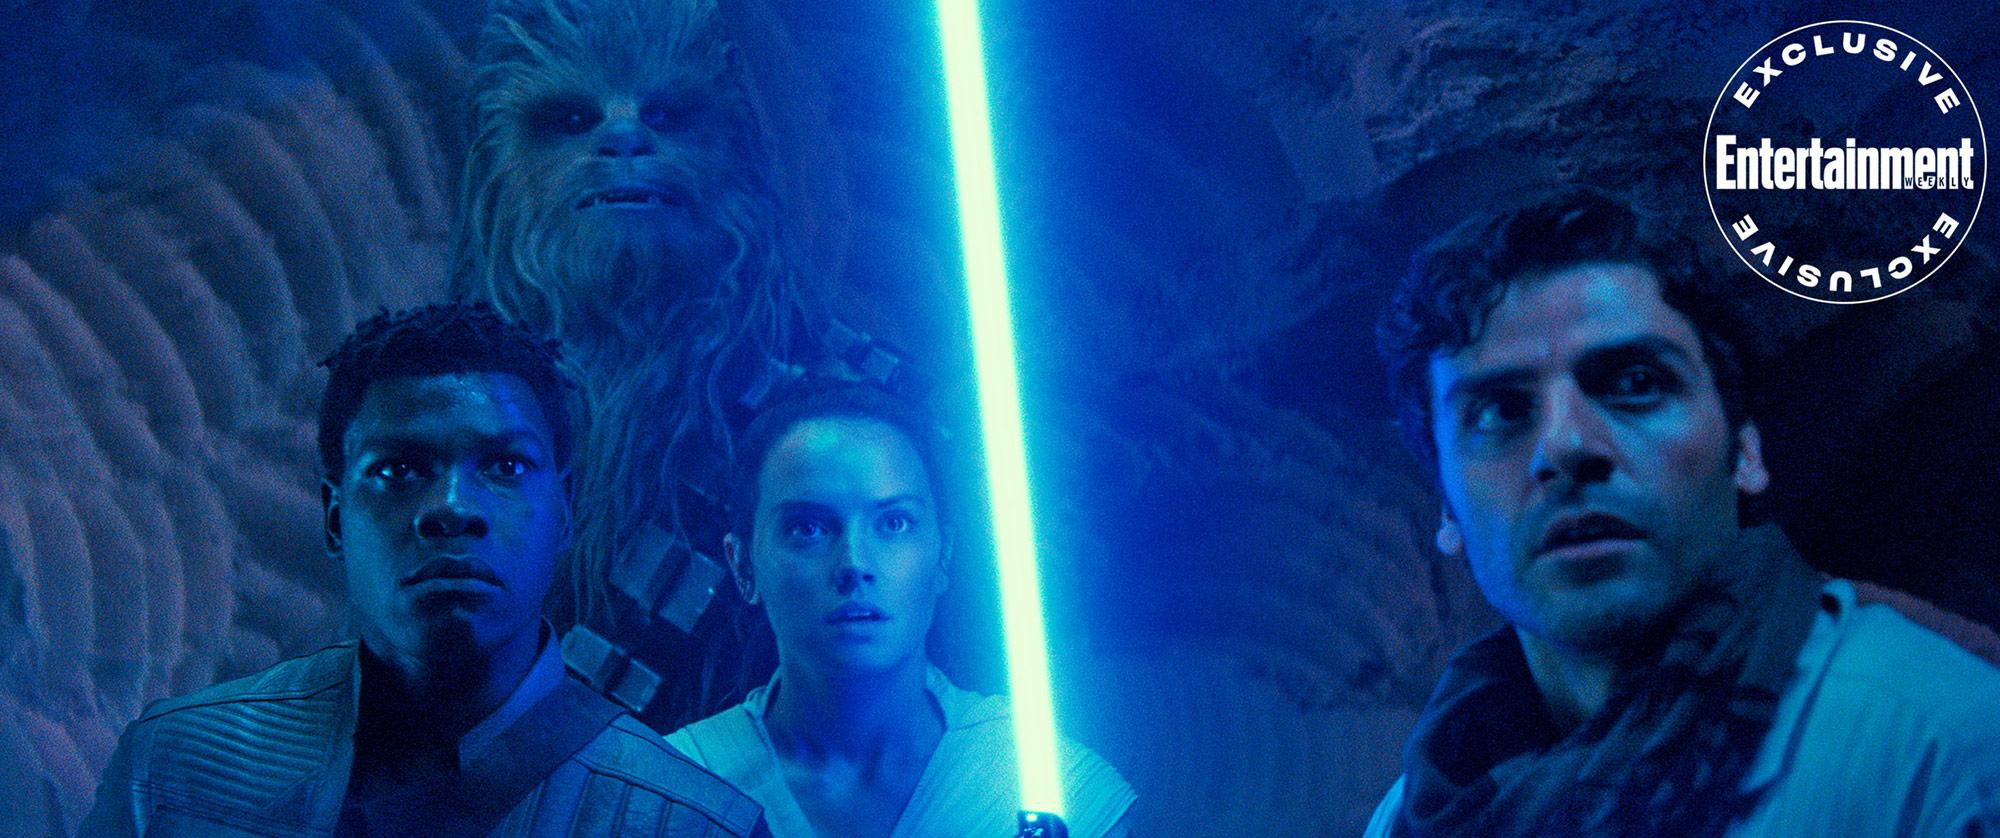 The Rise of Skywalker (EW 12/19)